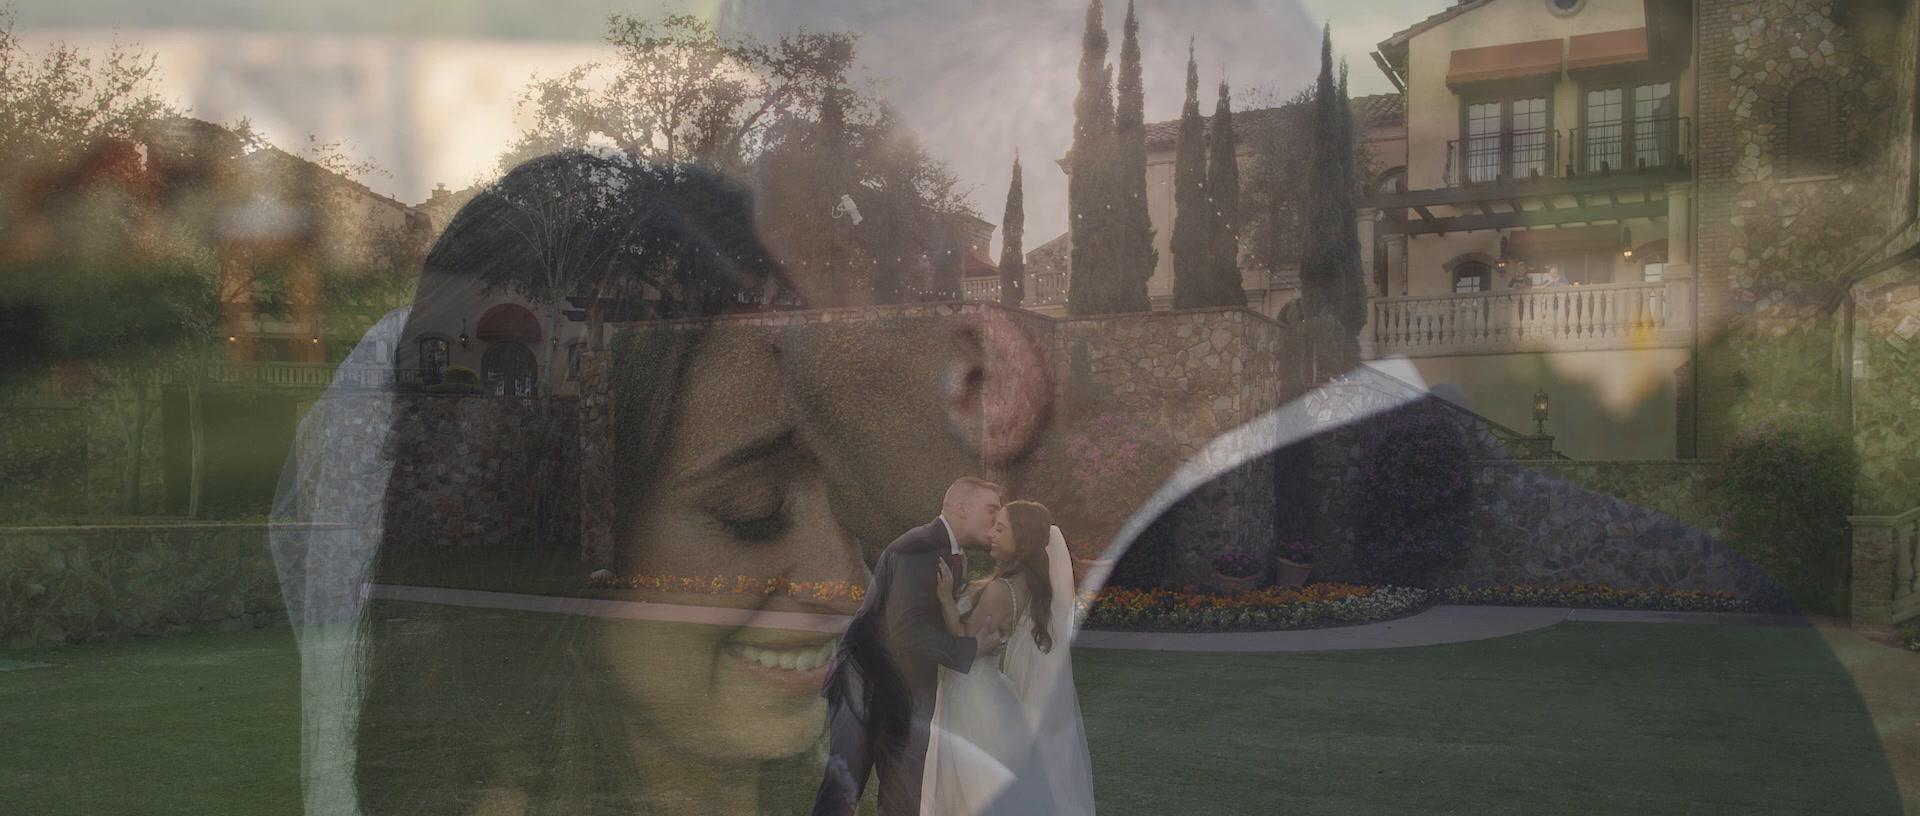 Lauren  + Andrew | Orlando, Florida | Bella Collina